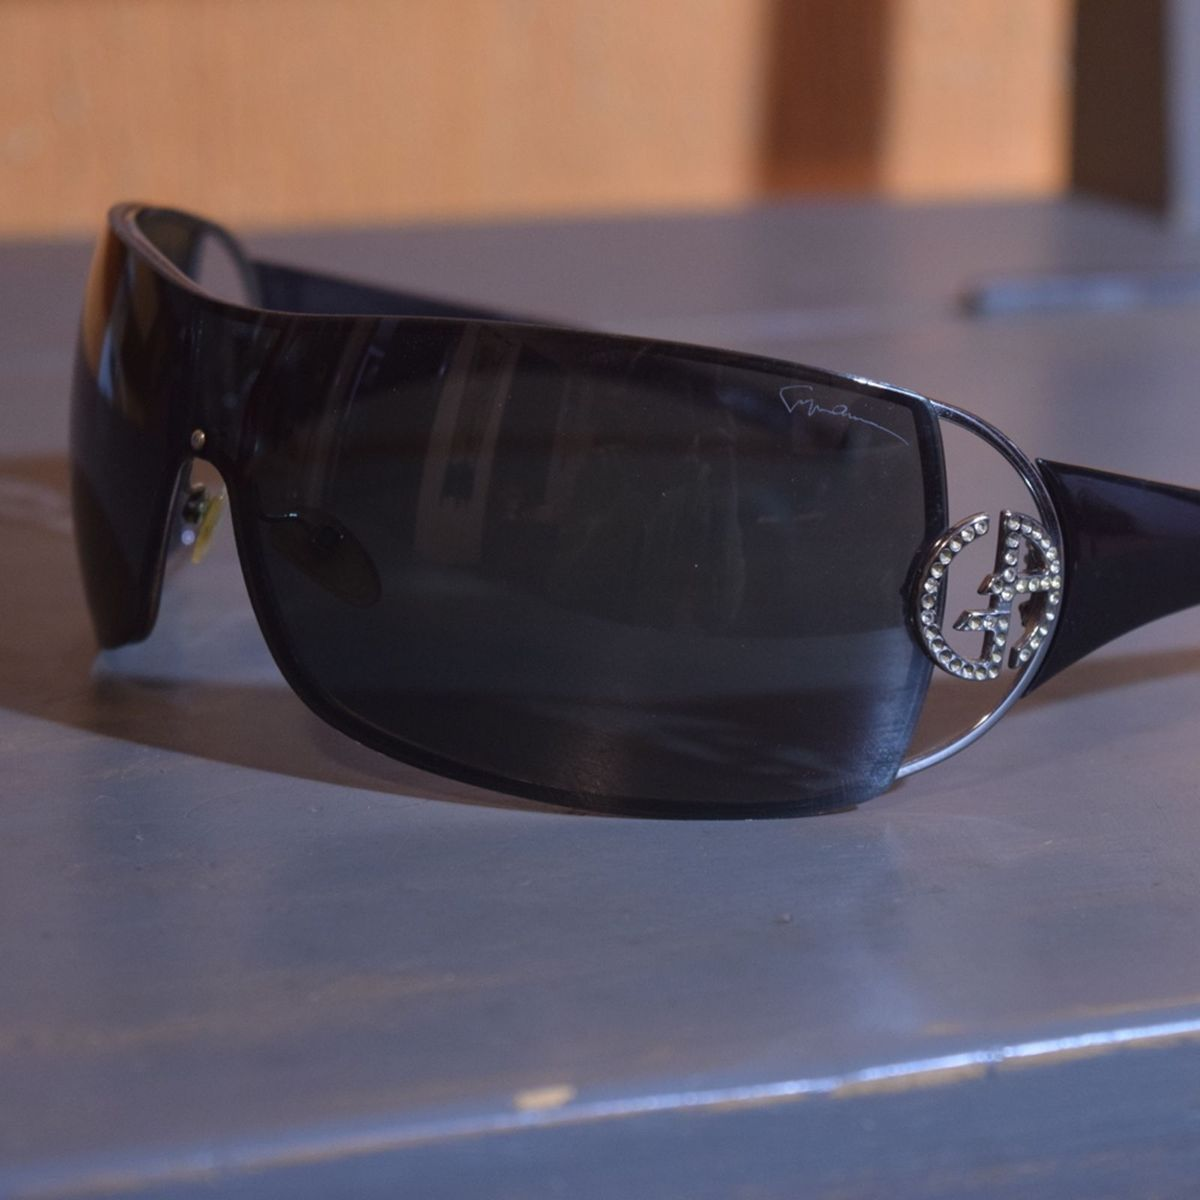 44643a17c Óculos de Sol Giorgio Armani | Óculos Feminino Giorgio Armani Usado ...